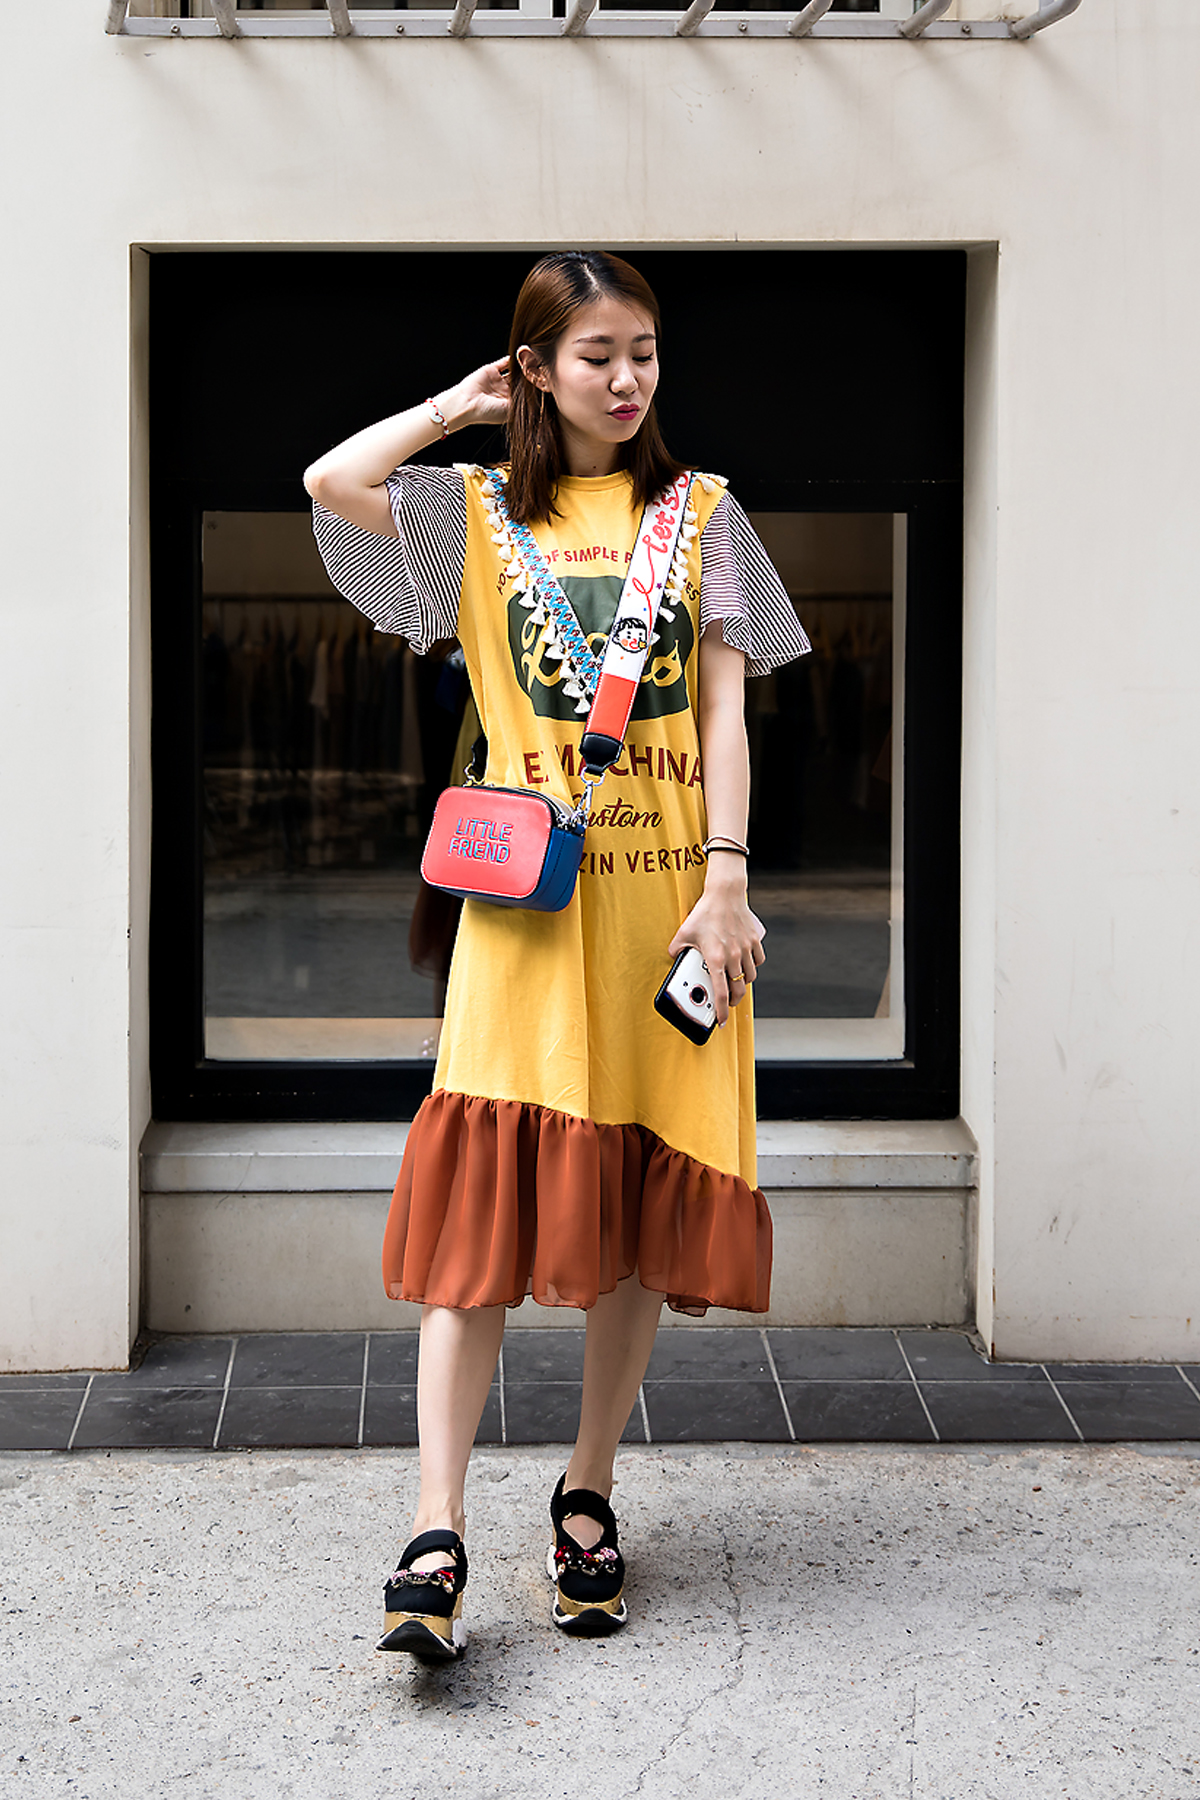 Linlang, Street Fashion 2017 in Seoul.jpg